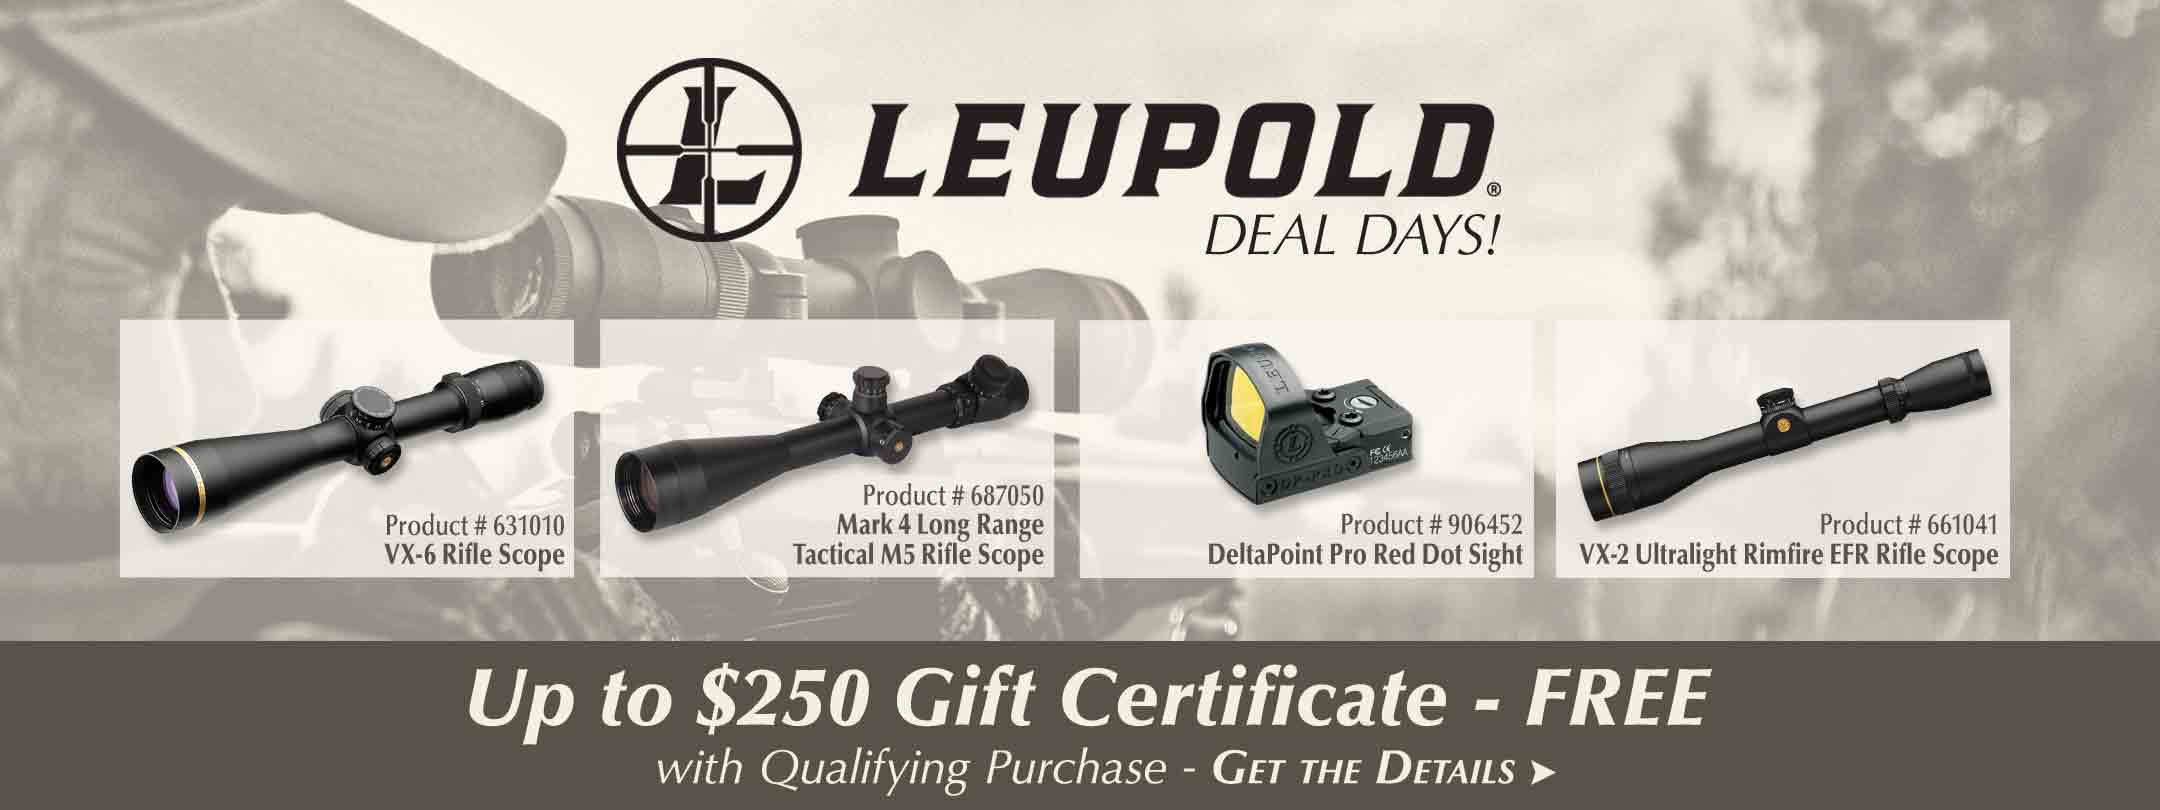 Leupold Deal Days: $75 - $250 Gift Certificate